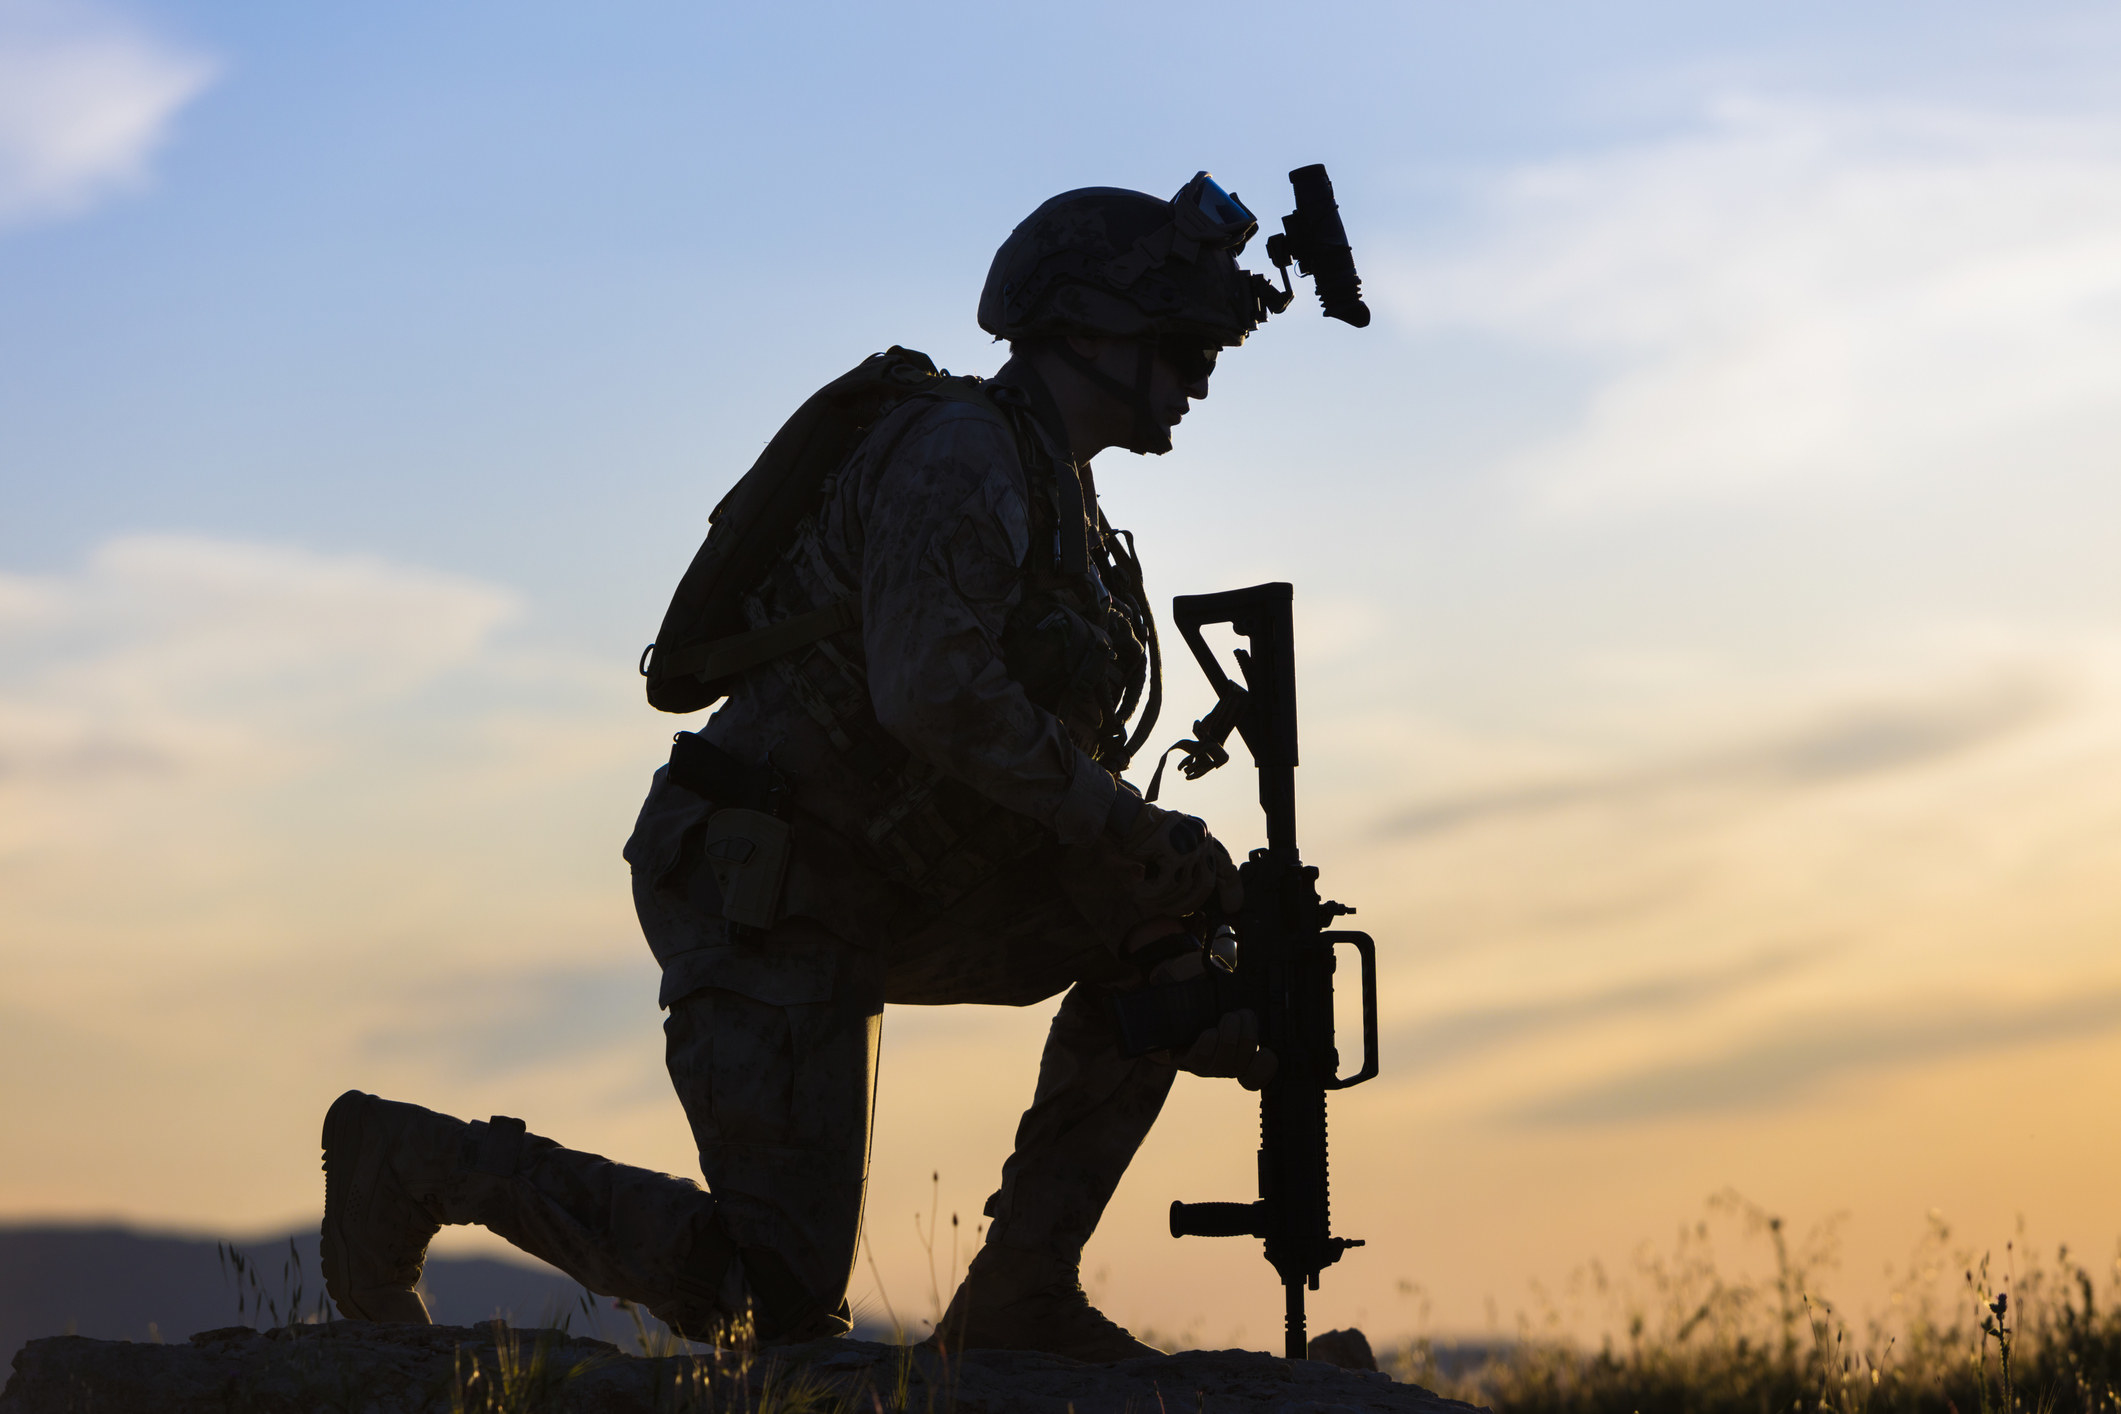 A kneeling soldier